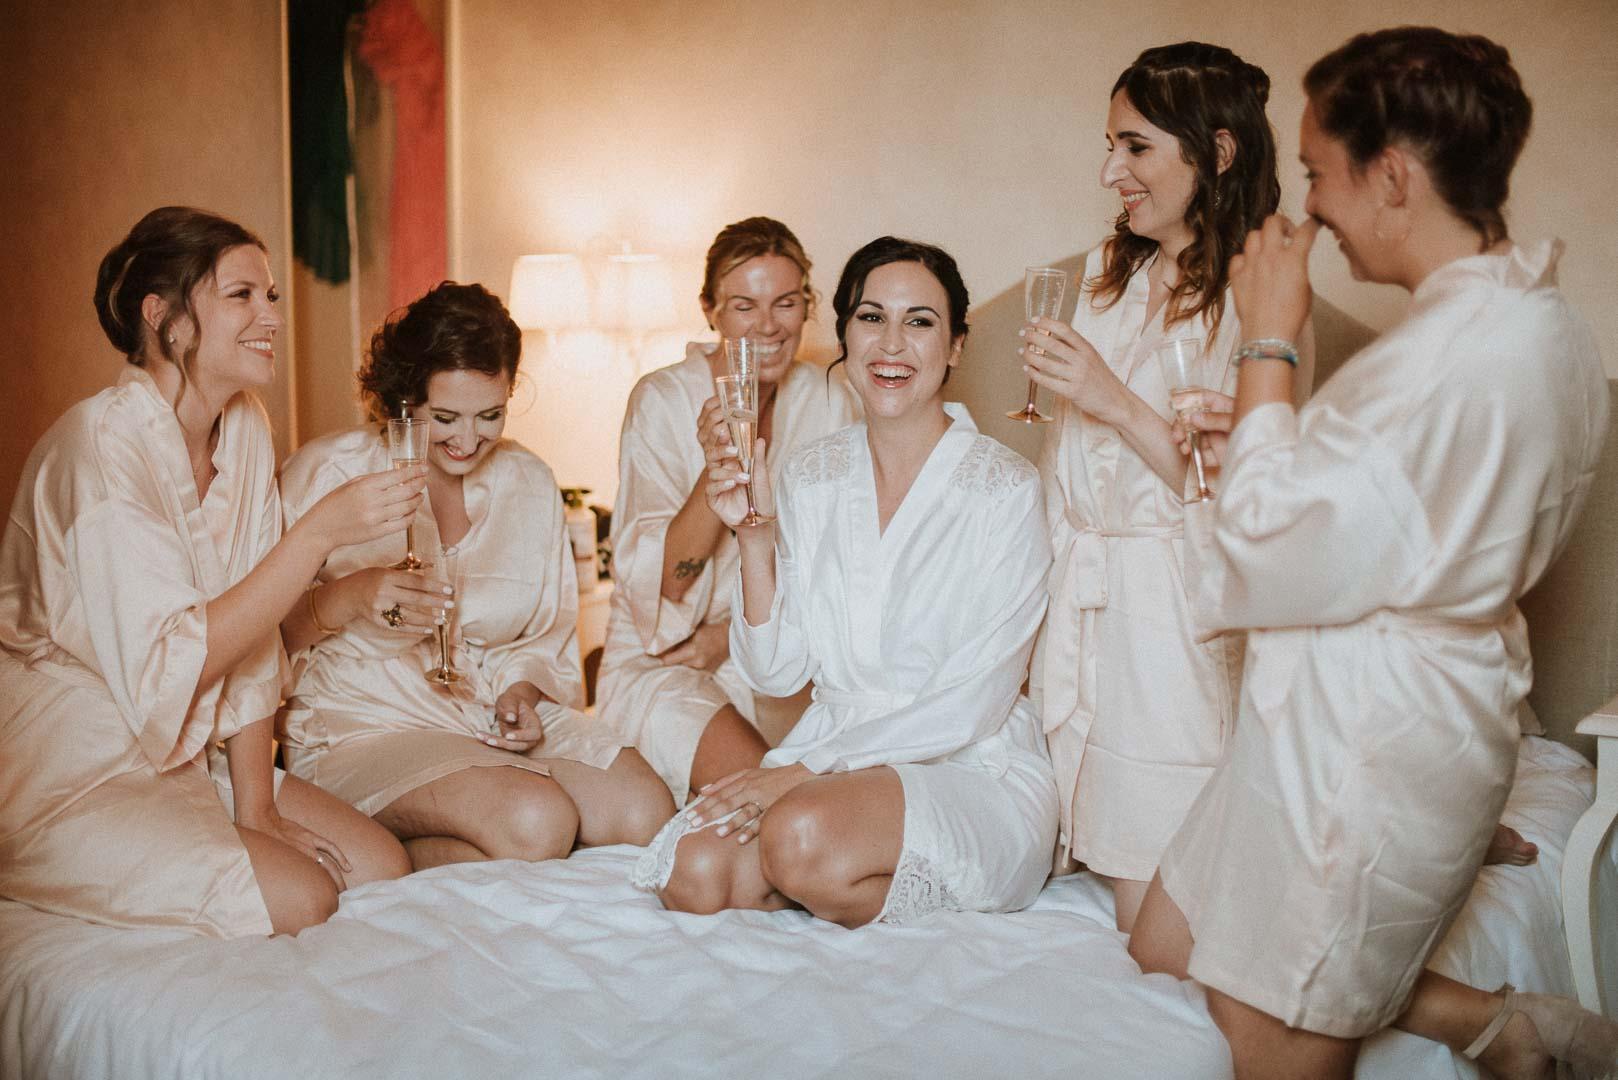 wedding-photographer-destination-fineart-bespoke-reportage-tuscany-villascorzi-vivianeizzo-spazio46-42